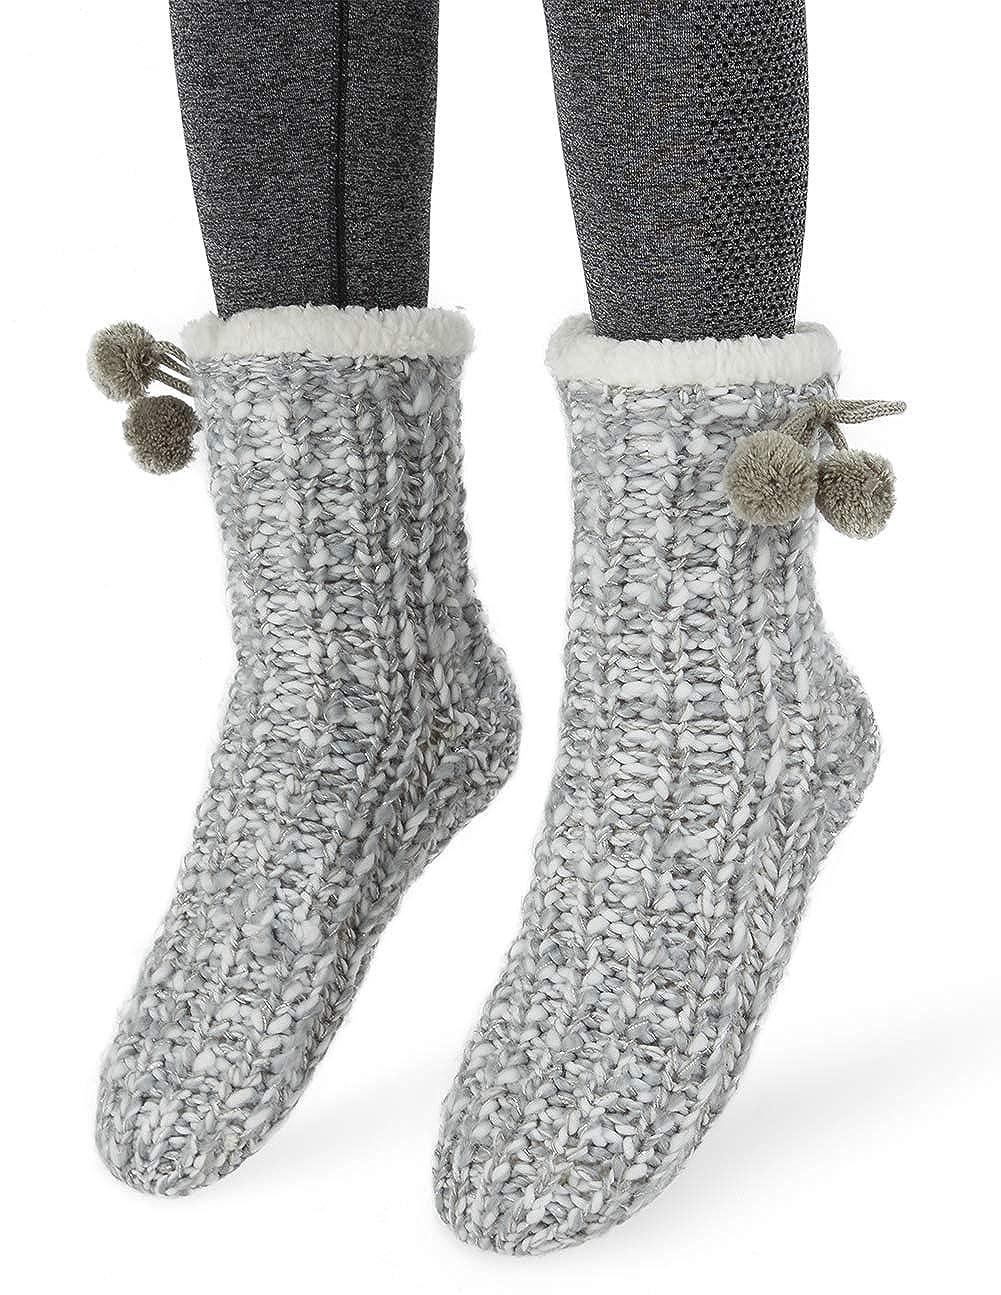 MaaMgic Donna Calze a pantofola inverno Tenere caldo antiscivolo Femmina Floor Calze calze invernali carine 1813071033500